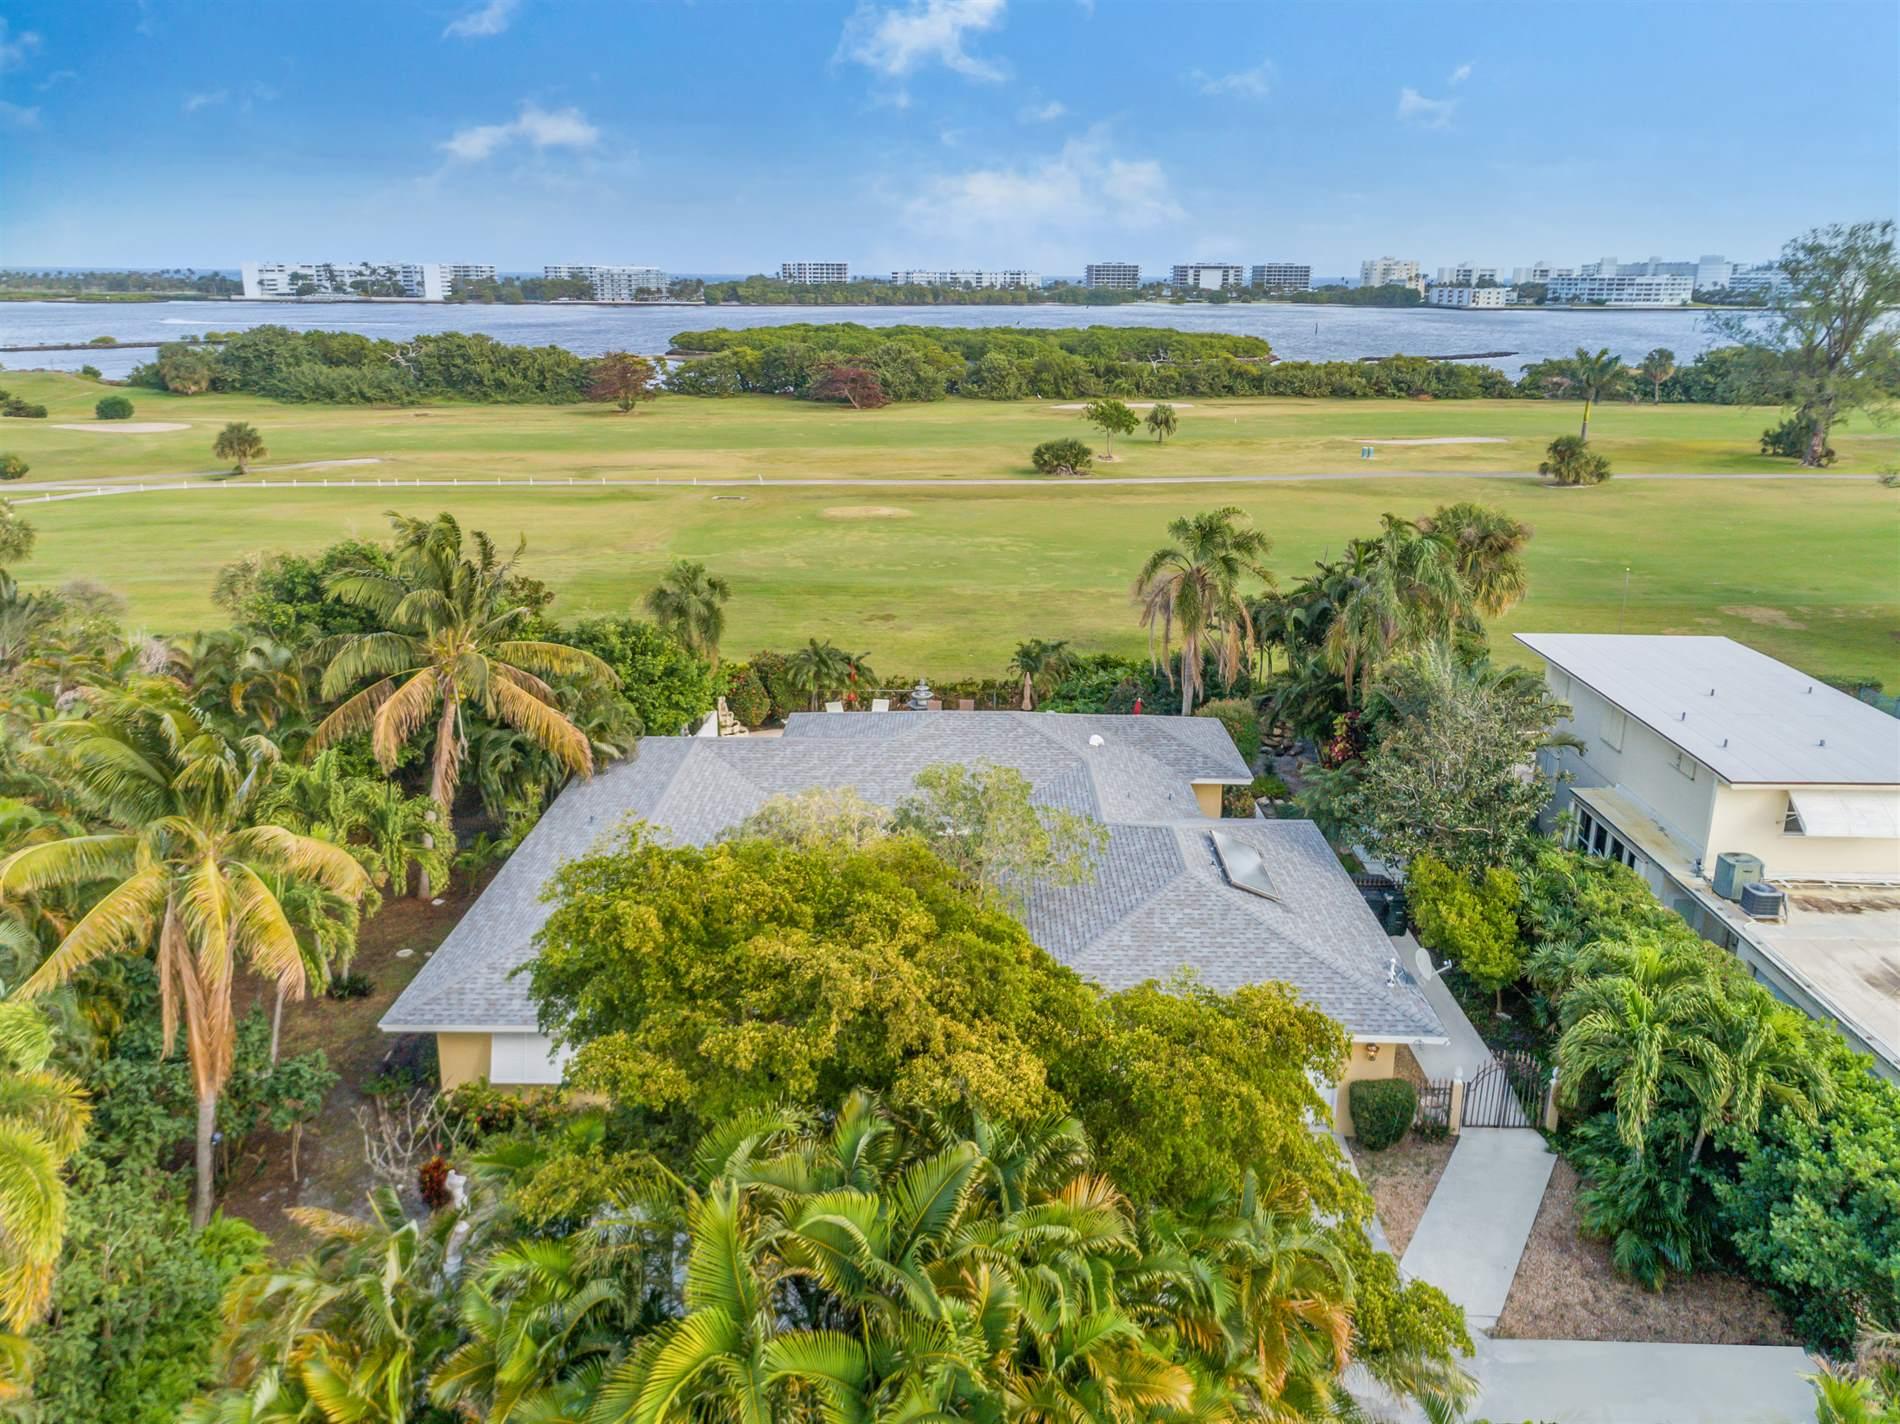 830 N. Golfview Rd, Lake Worth Beach, FL 33460